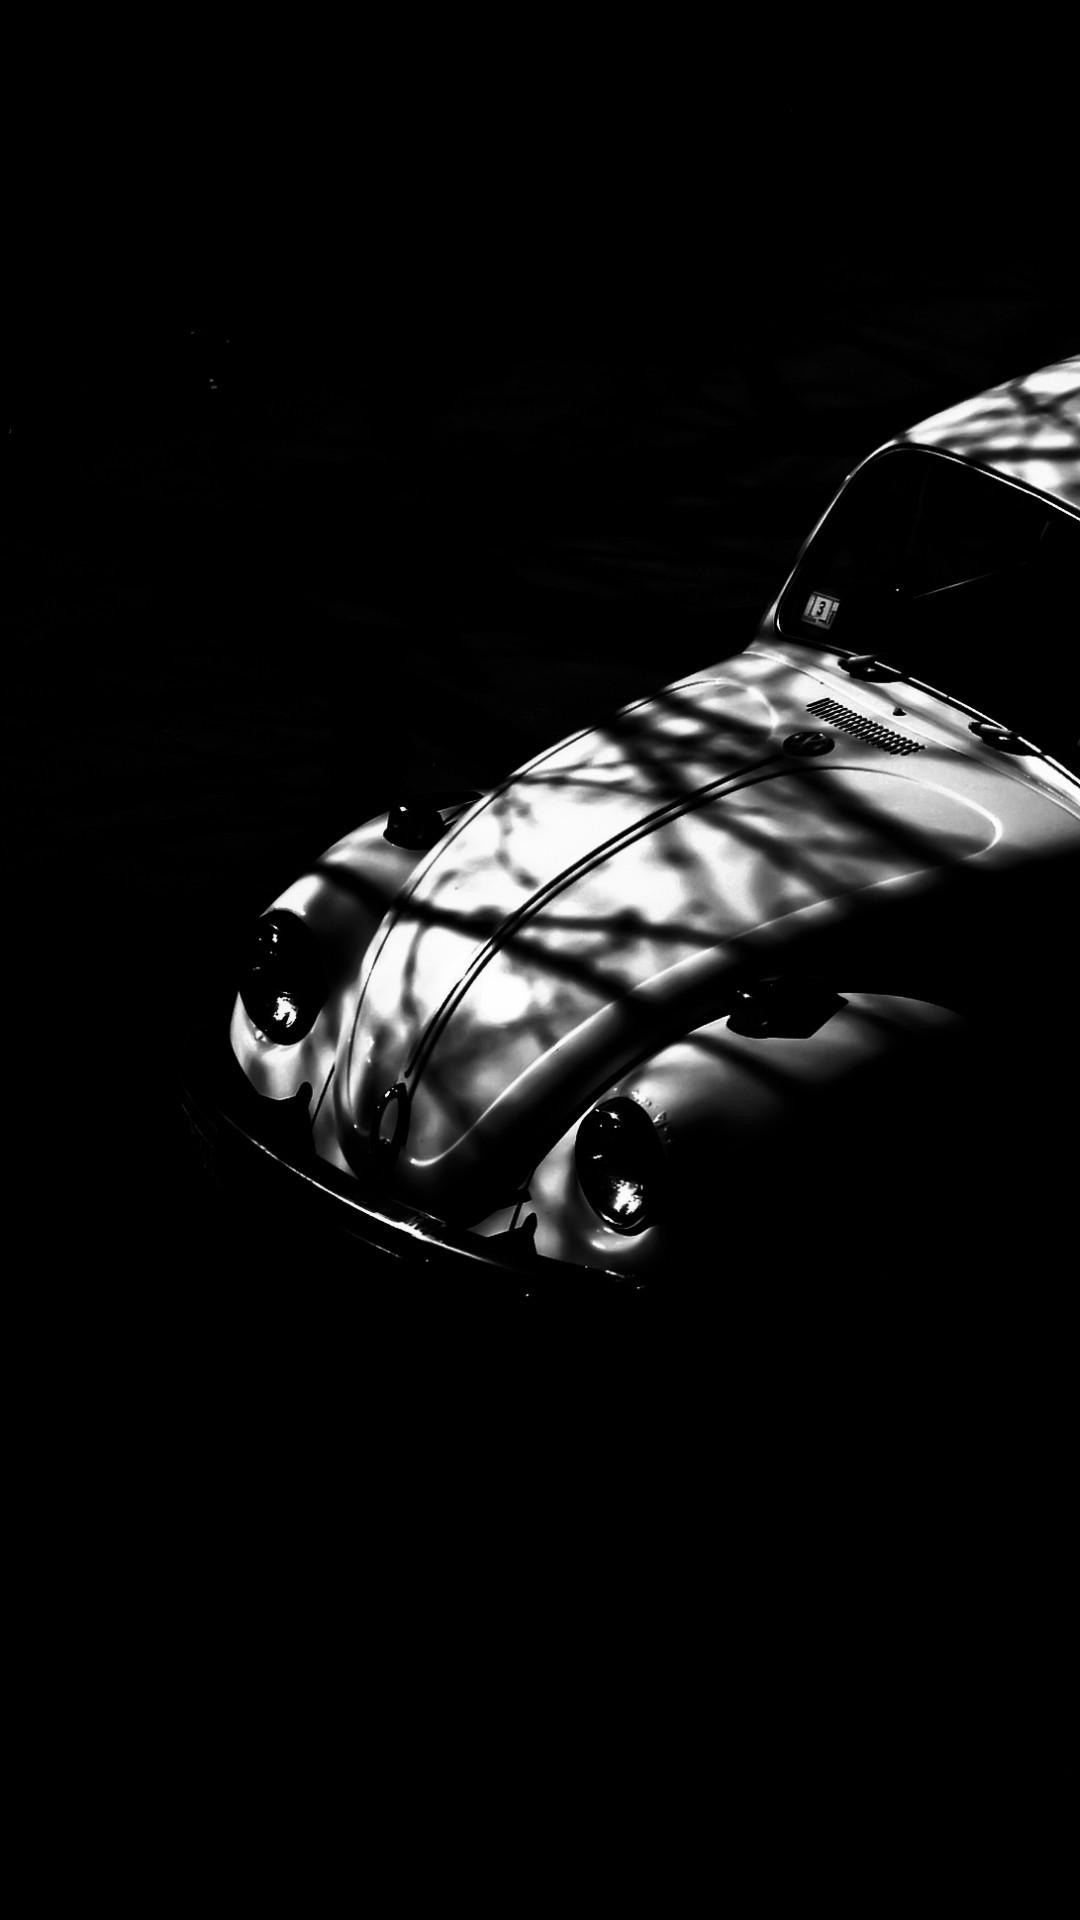 Car Wallpaper For Iphone Iphone Black Wallpaper Car 1080x1920 Wallpaper Teahub Io